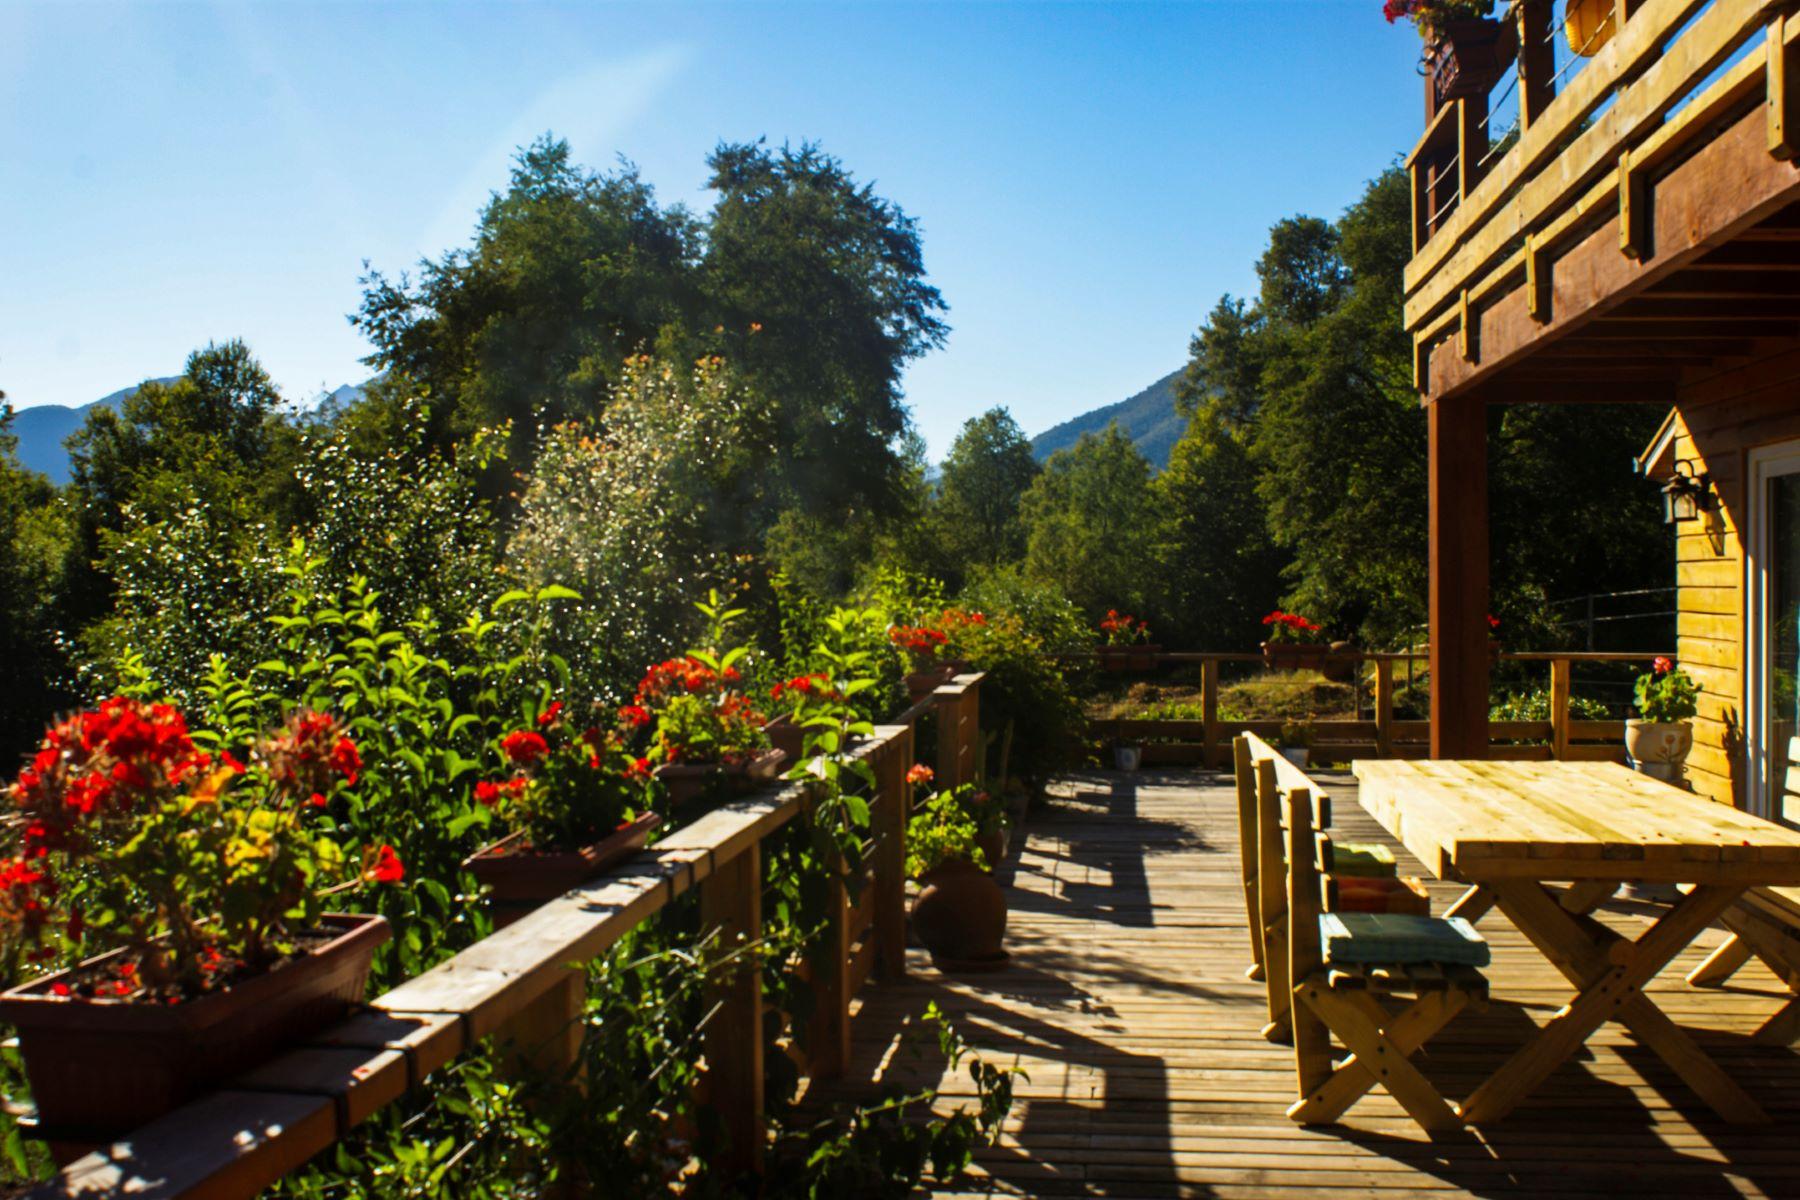 Single Family Home for Active at San Abelardo Farm El Carmen, Chillan, Bio Bio Chile